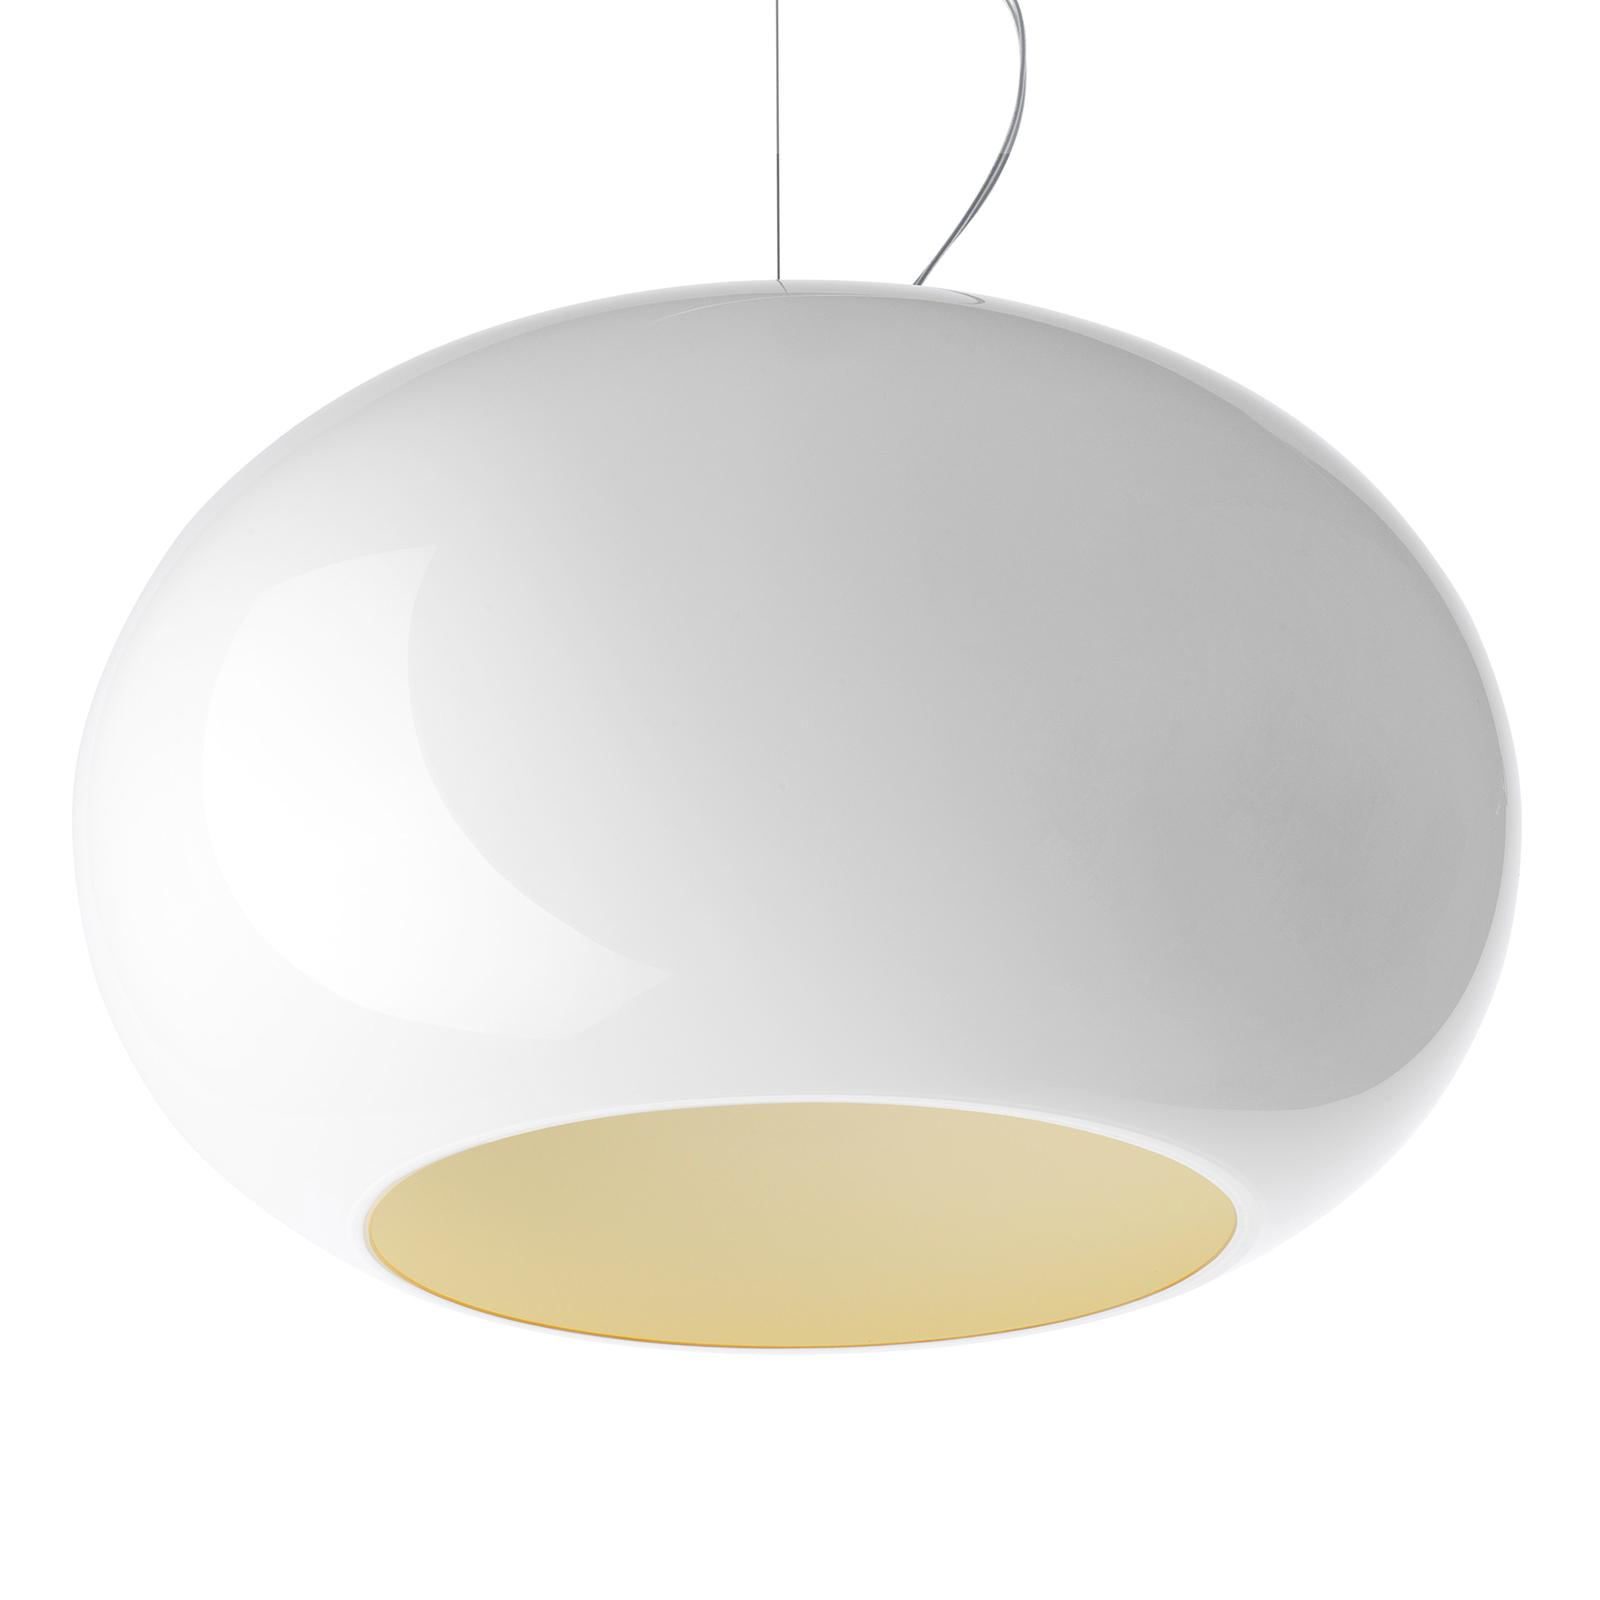 Foscarini MyLight Buds 2 LED-hengelampe, hvit